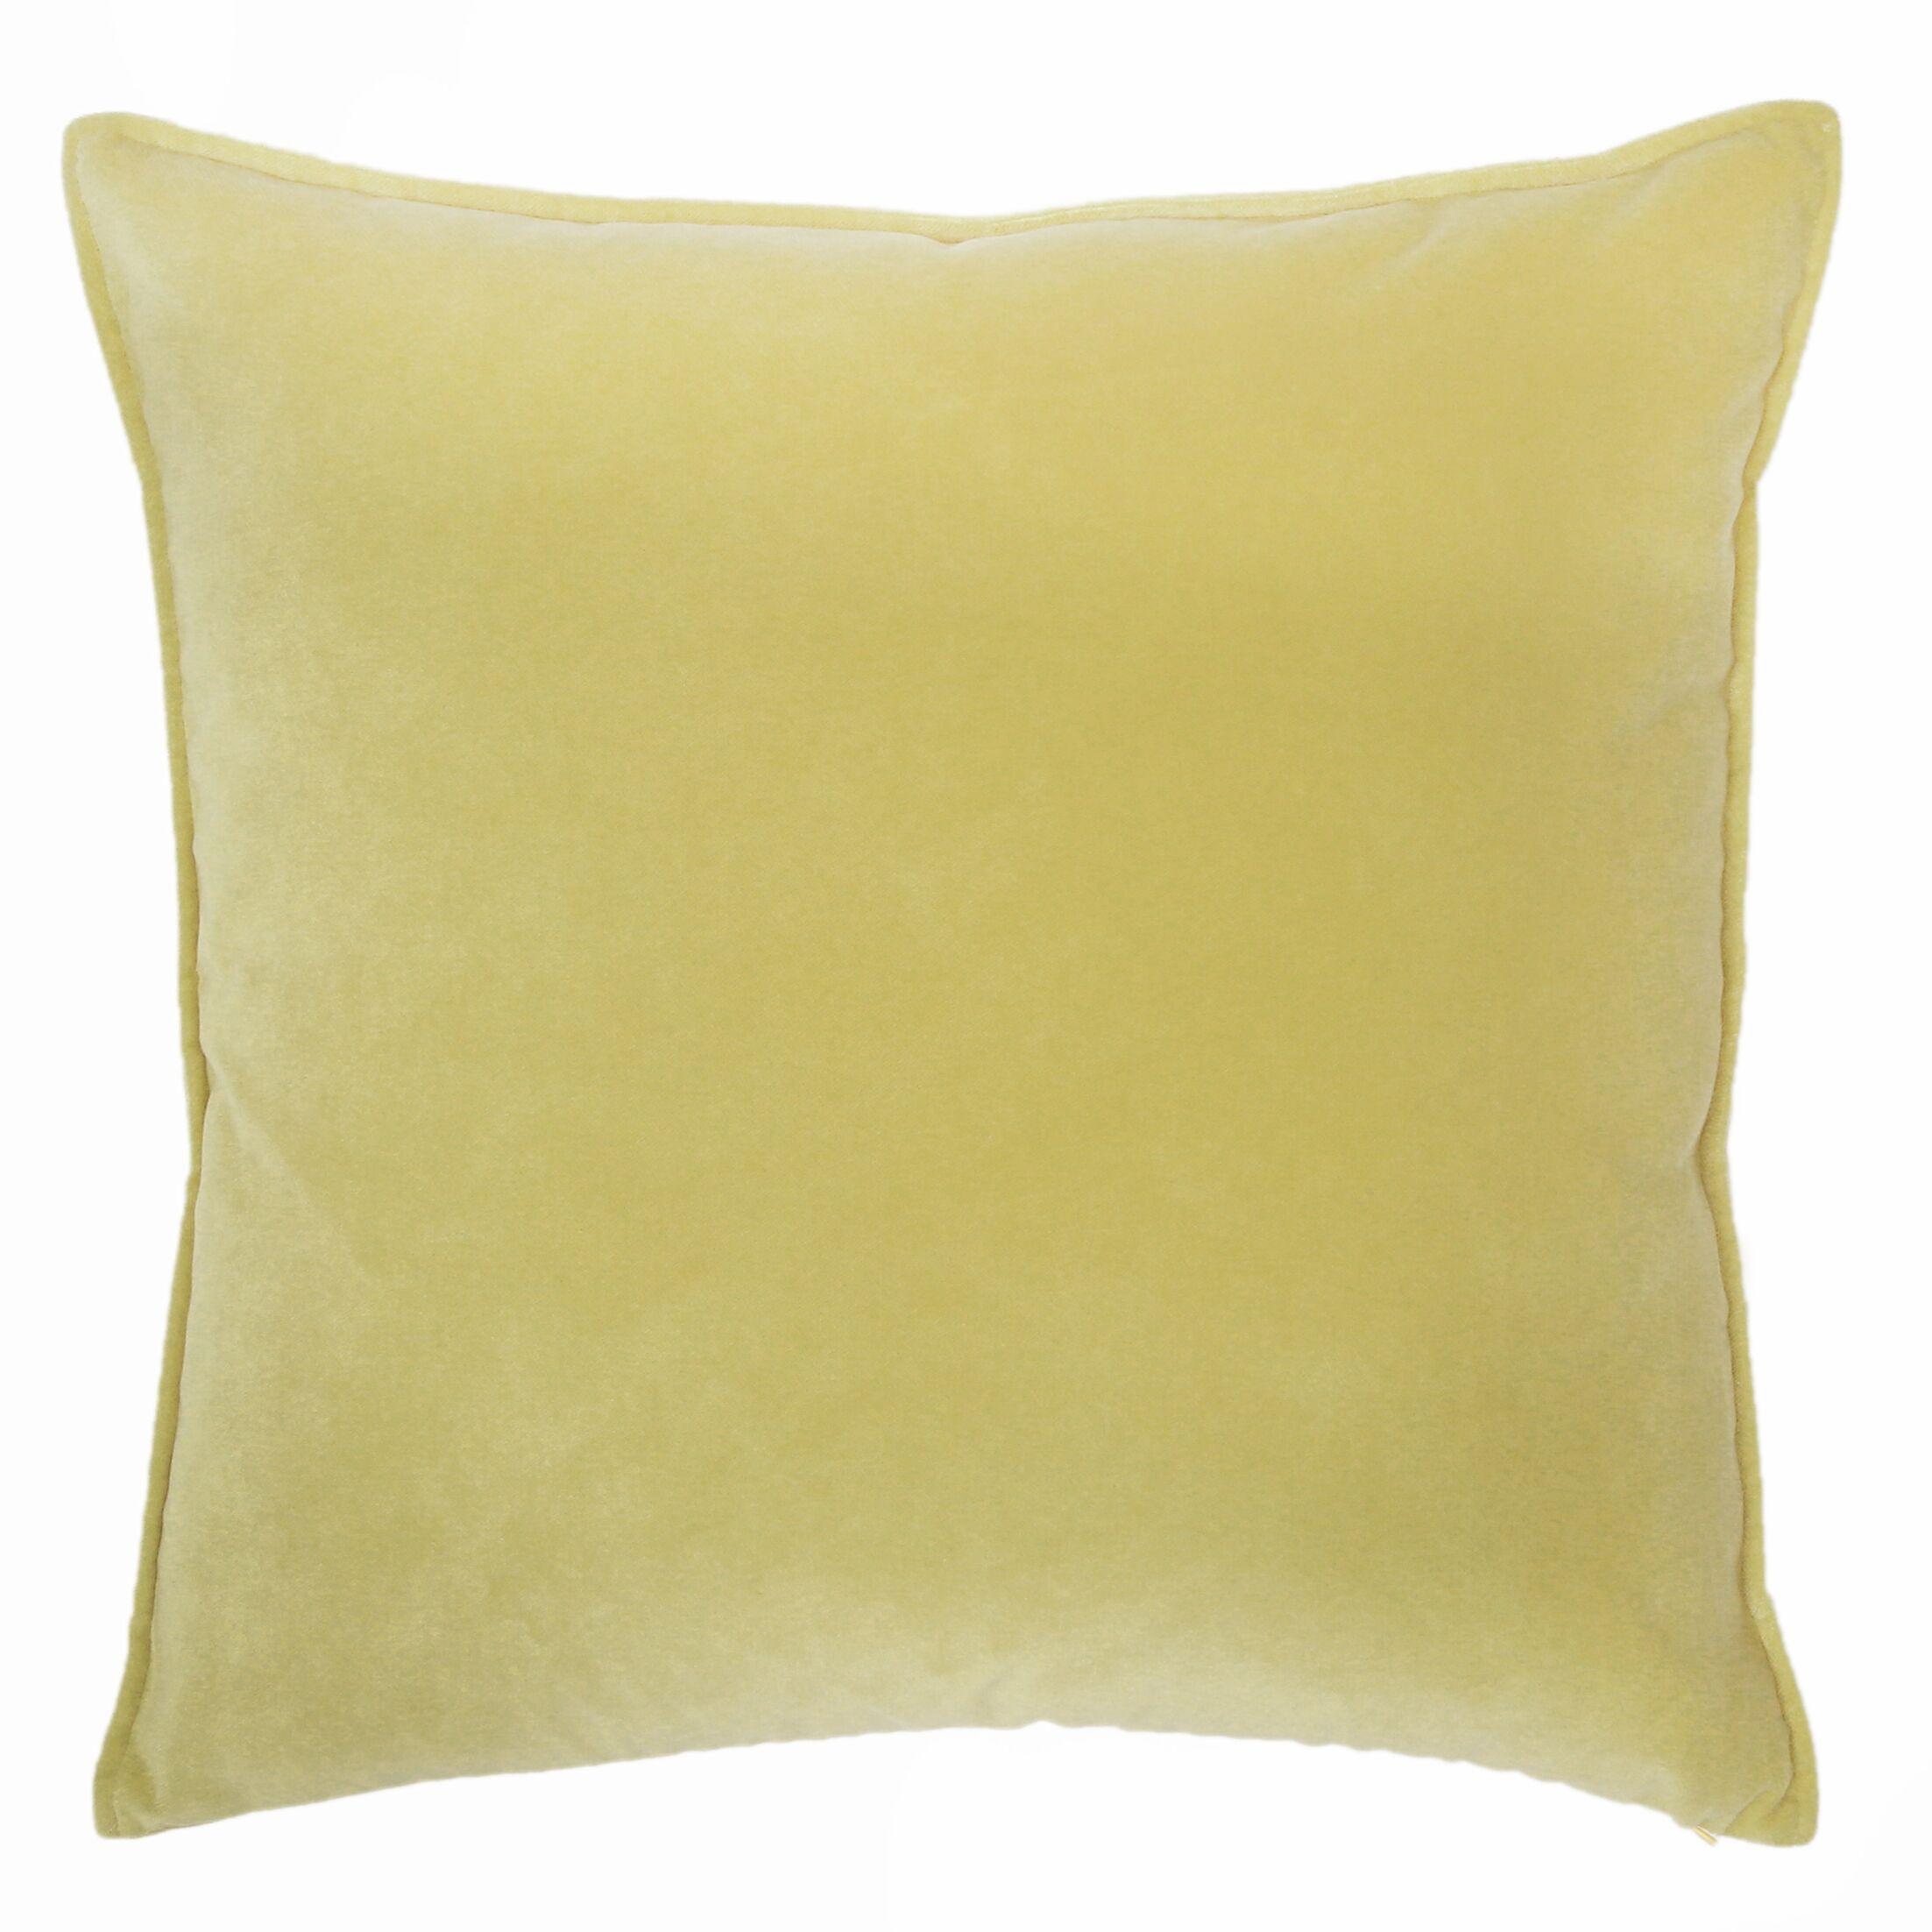 Franklin Throw Pillow Color: Citrus